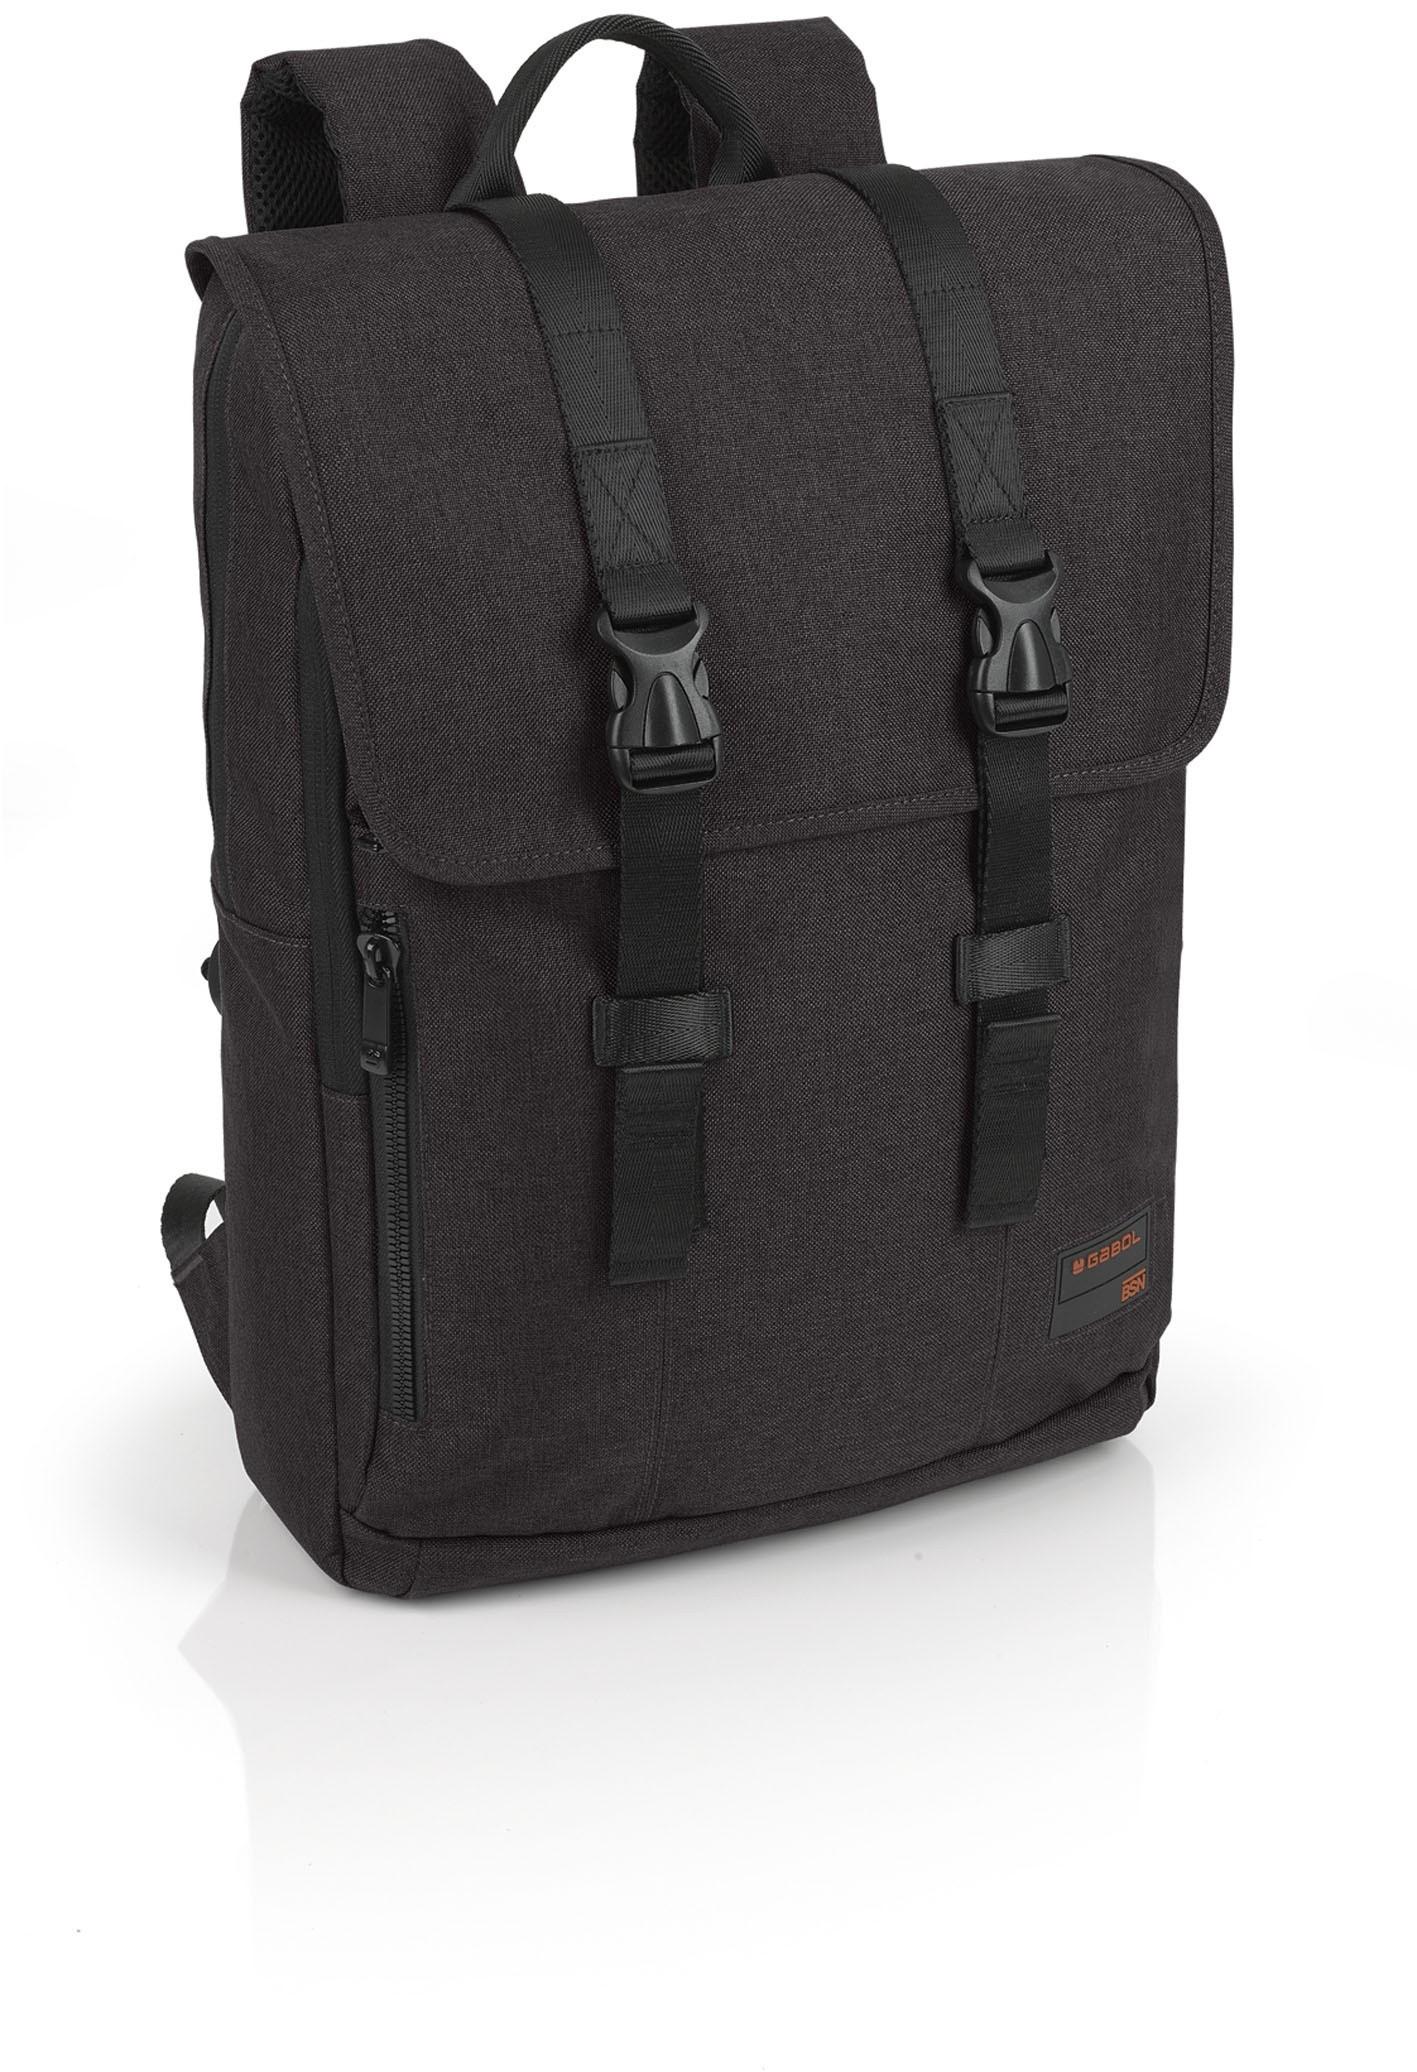 Gabol Spectrum Backpack 15.6 inch 409006 Grey